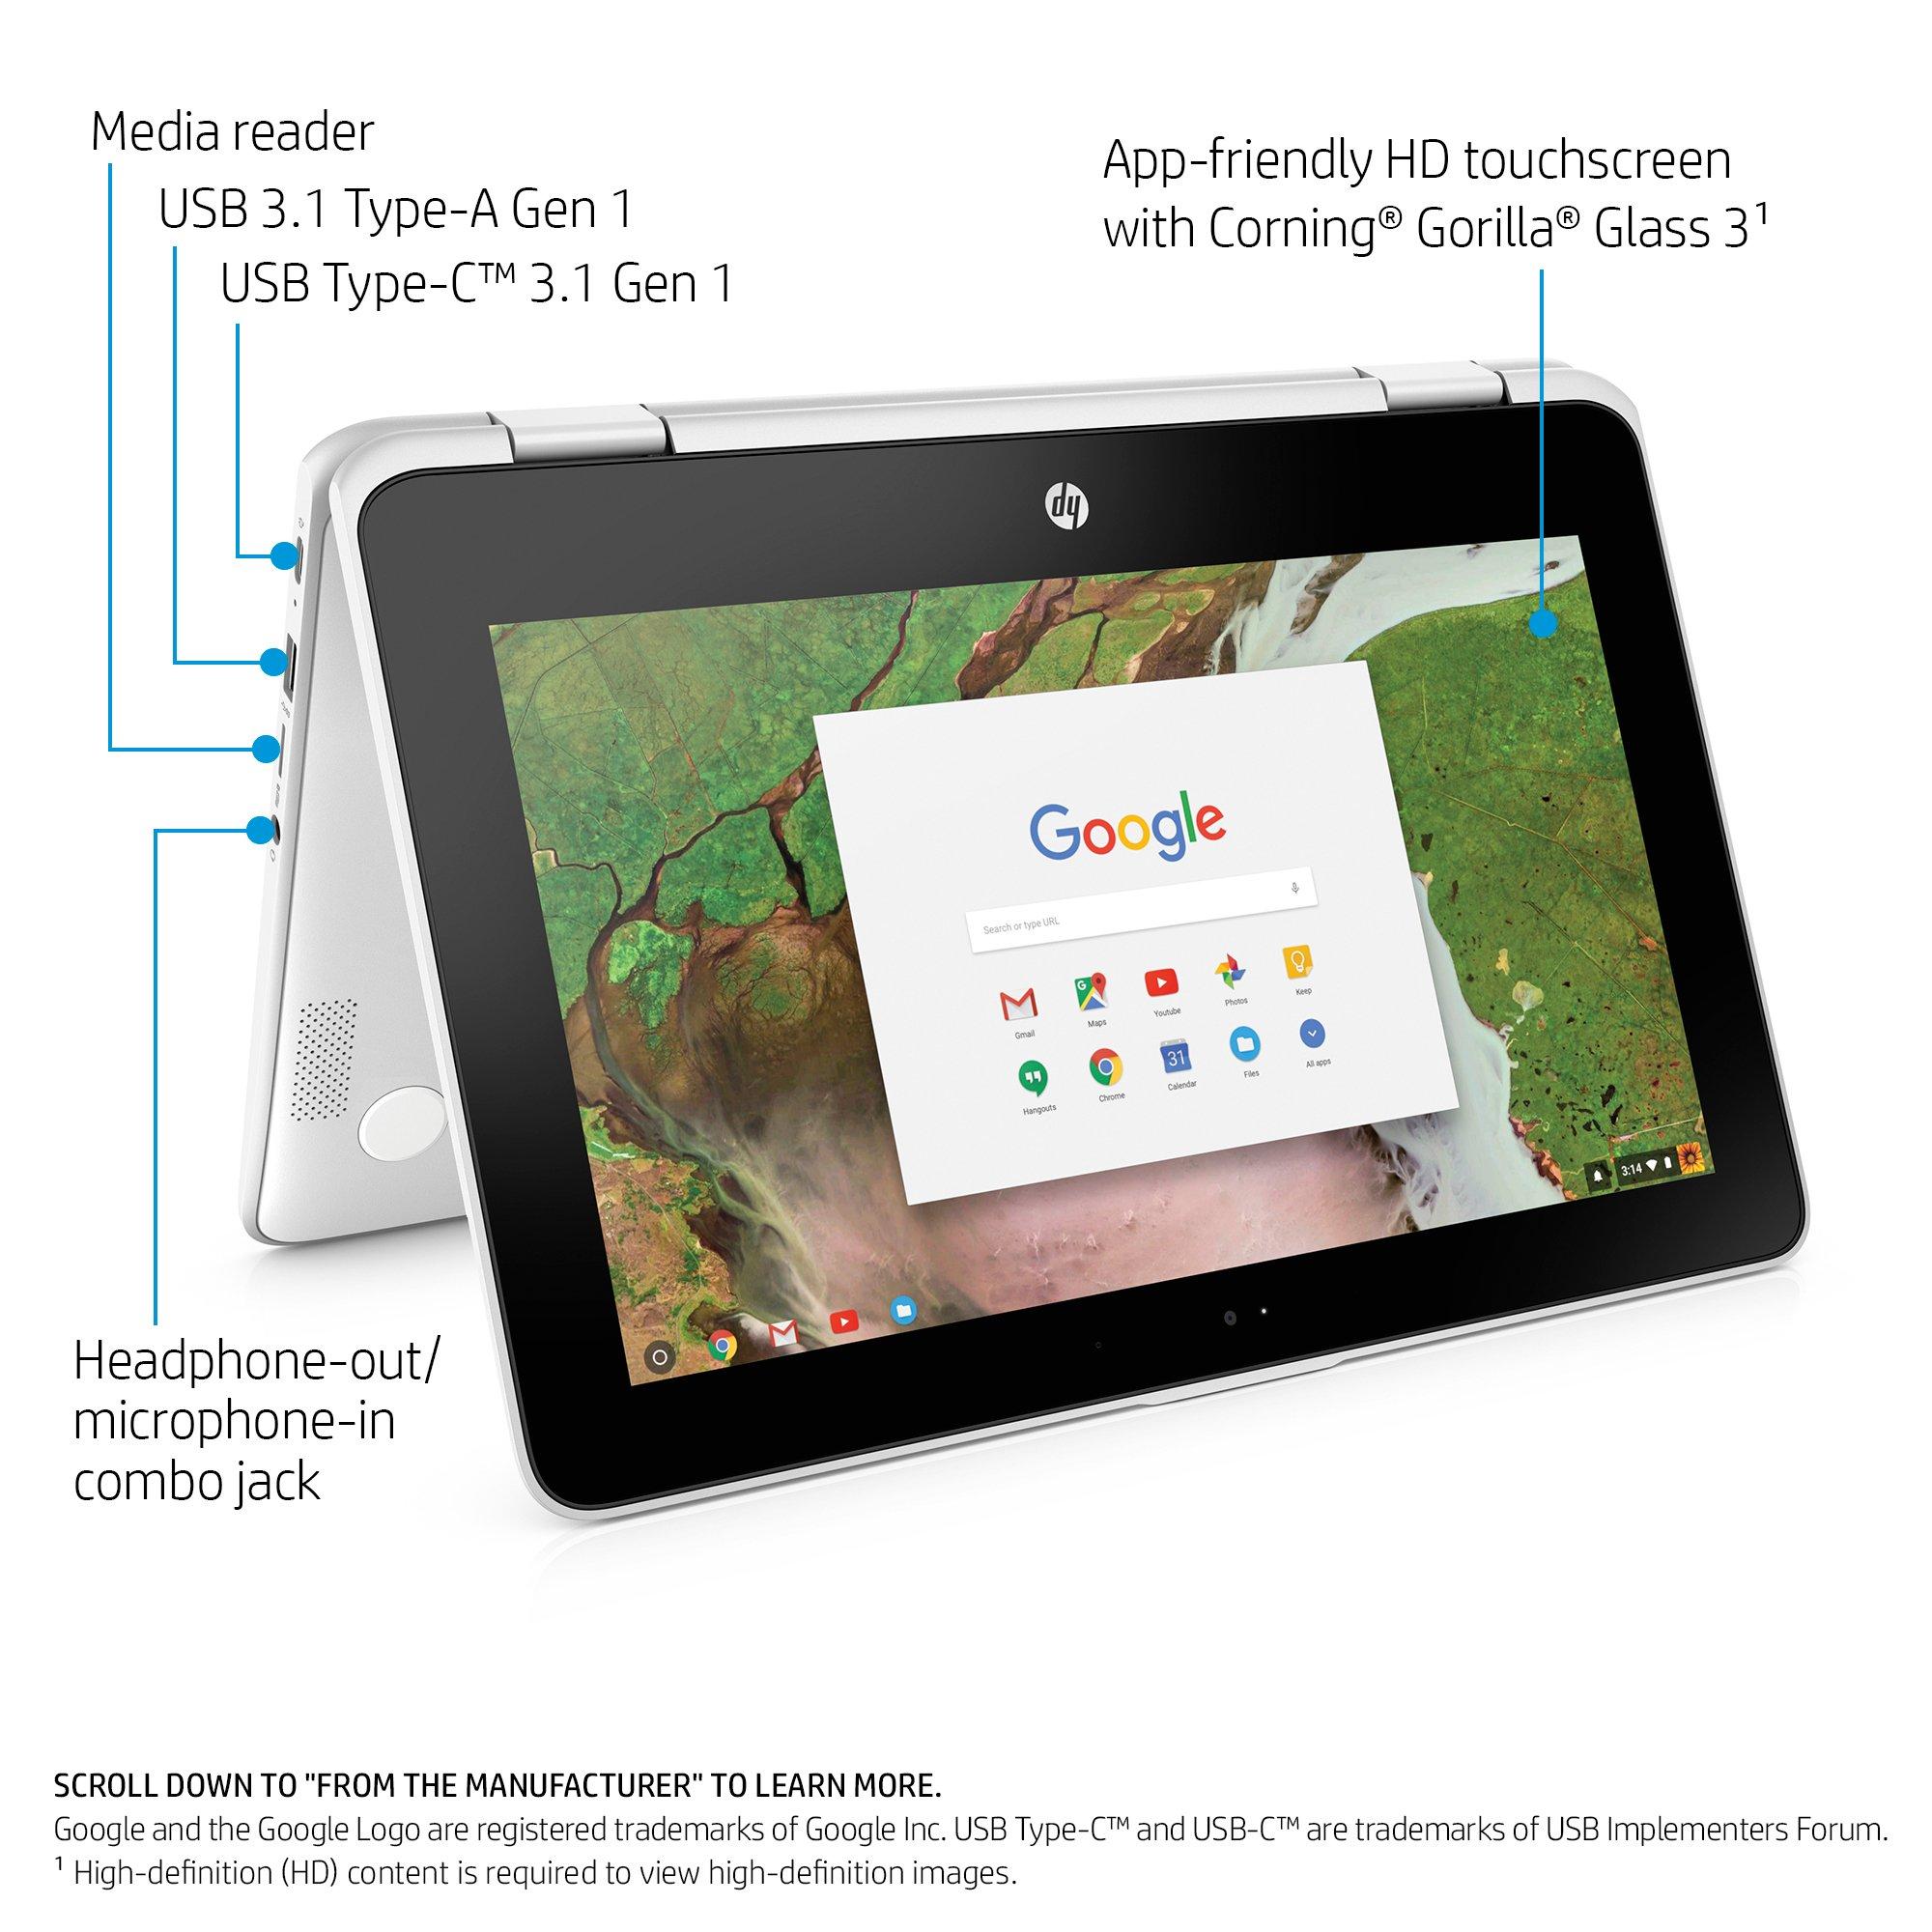 HP Chromebook x360 11-inch Convertible Laptop, Intel Celeron N3350, 4GB RAM, 32GB eMMC storage, Chrome OS (11-ae040nr, White) by HP (Image #2)